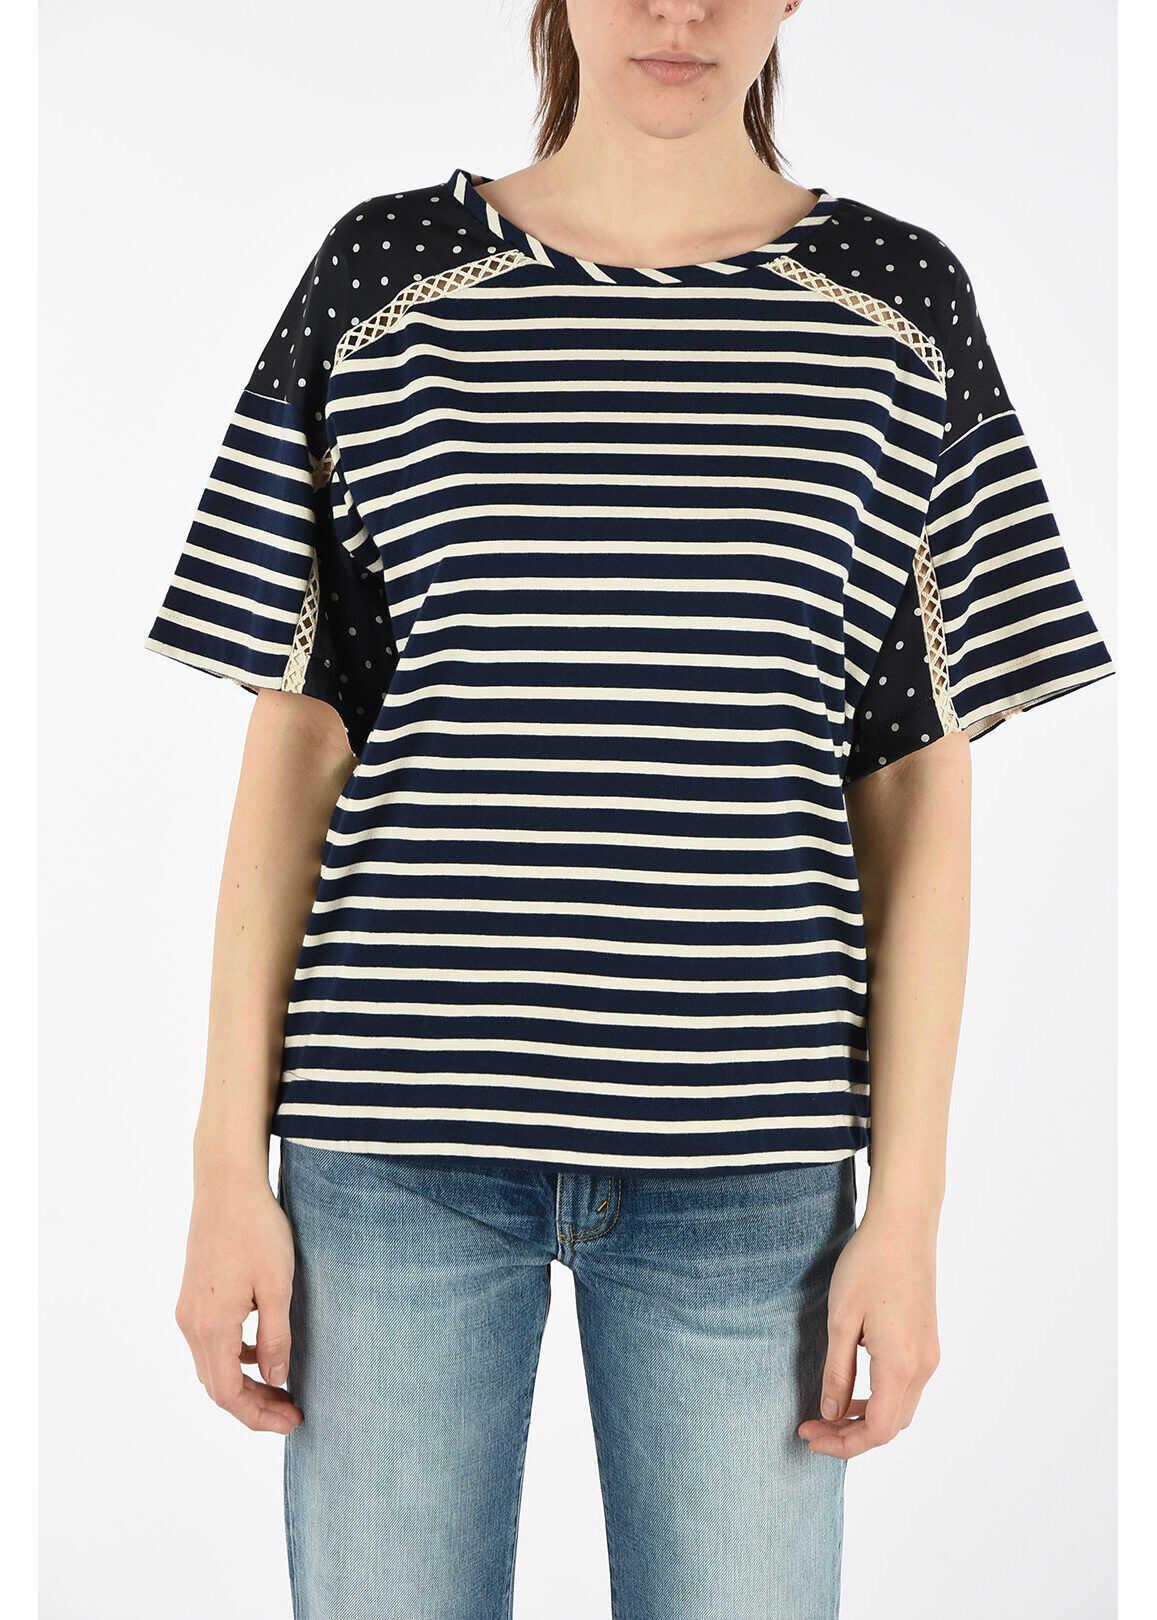 Ermanno Scervino Striped T-shirt BLUE